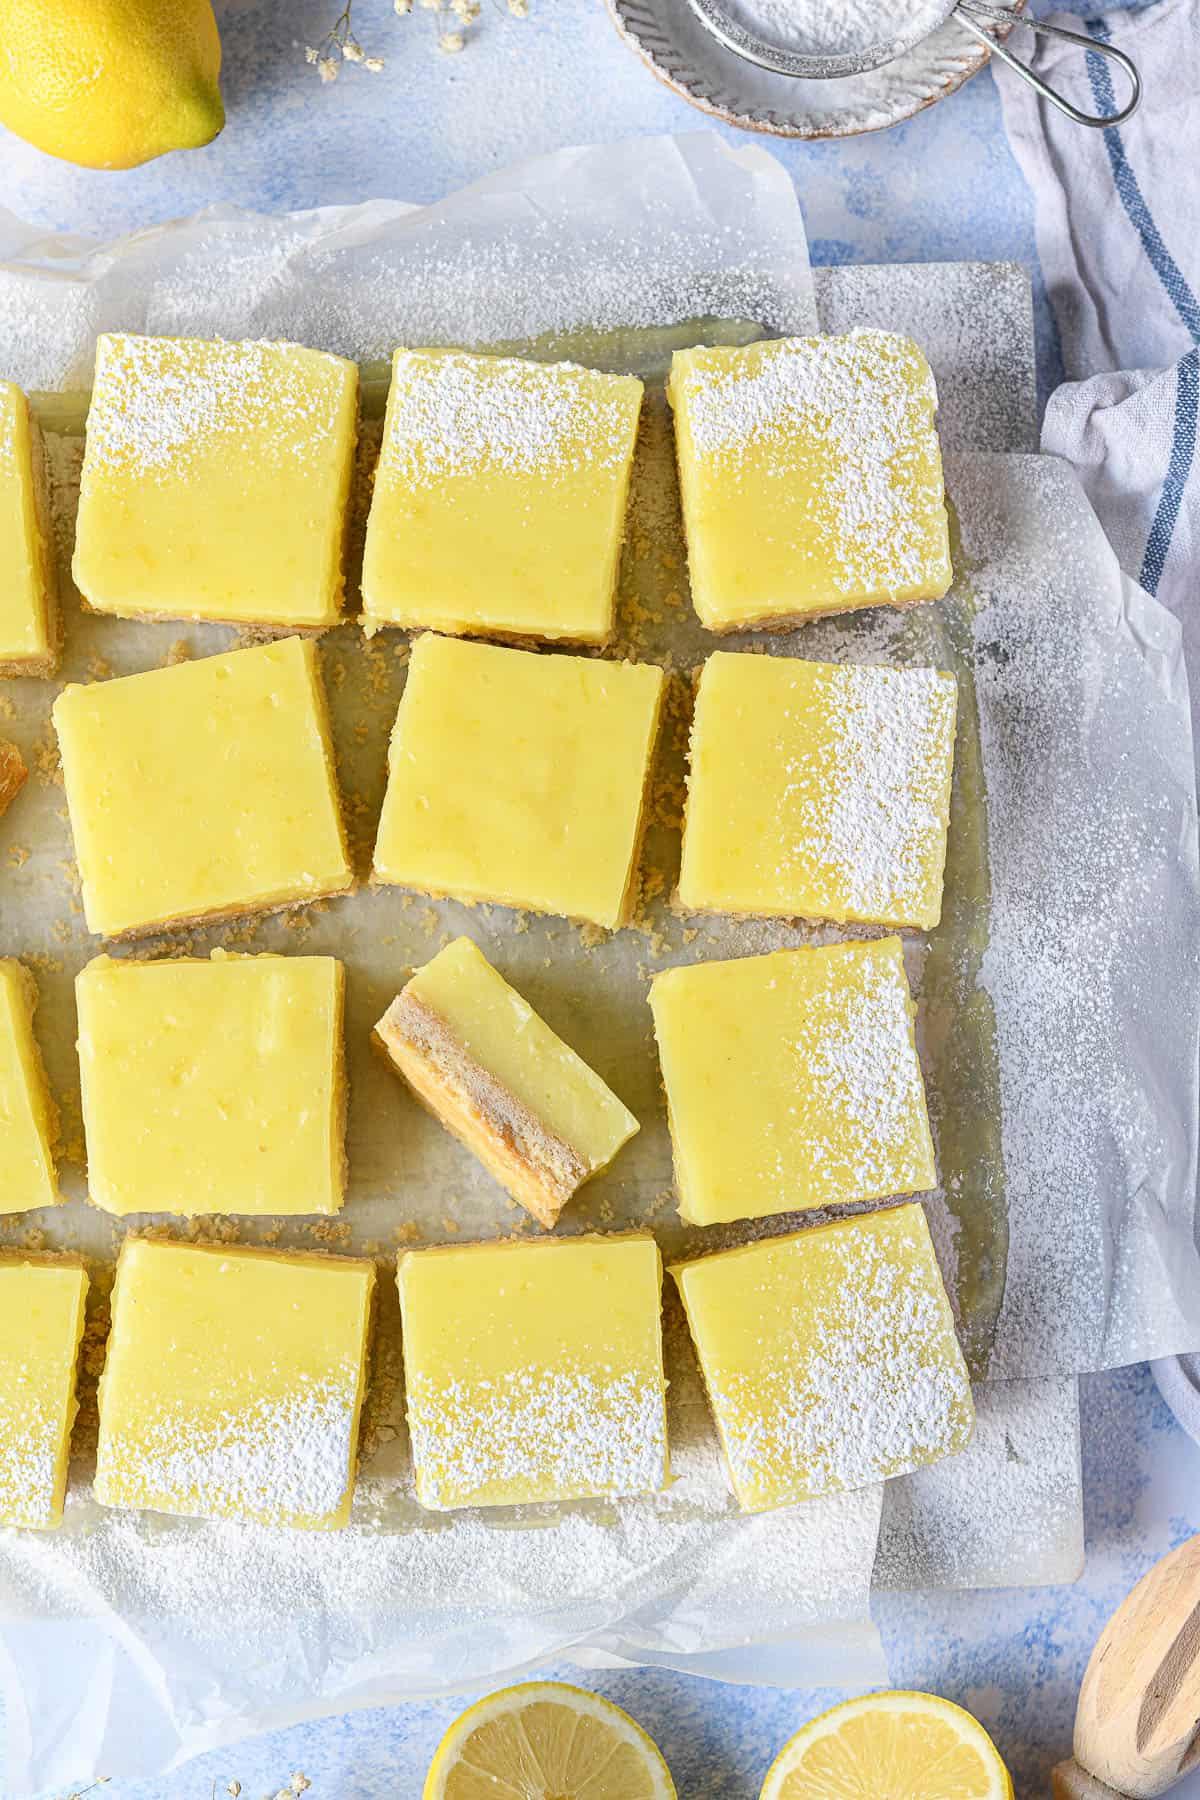 Close up of the sliced vegan lemon bars.